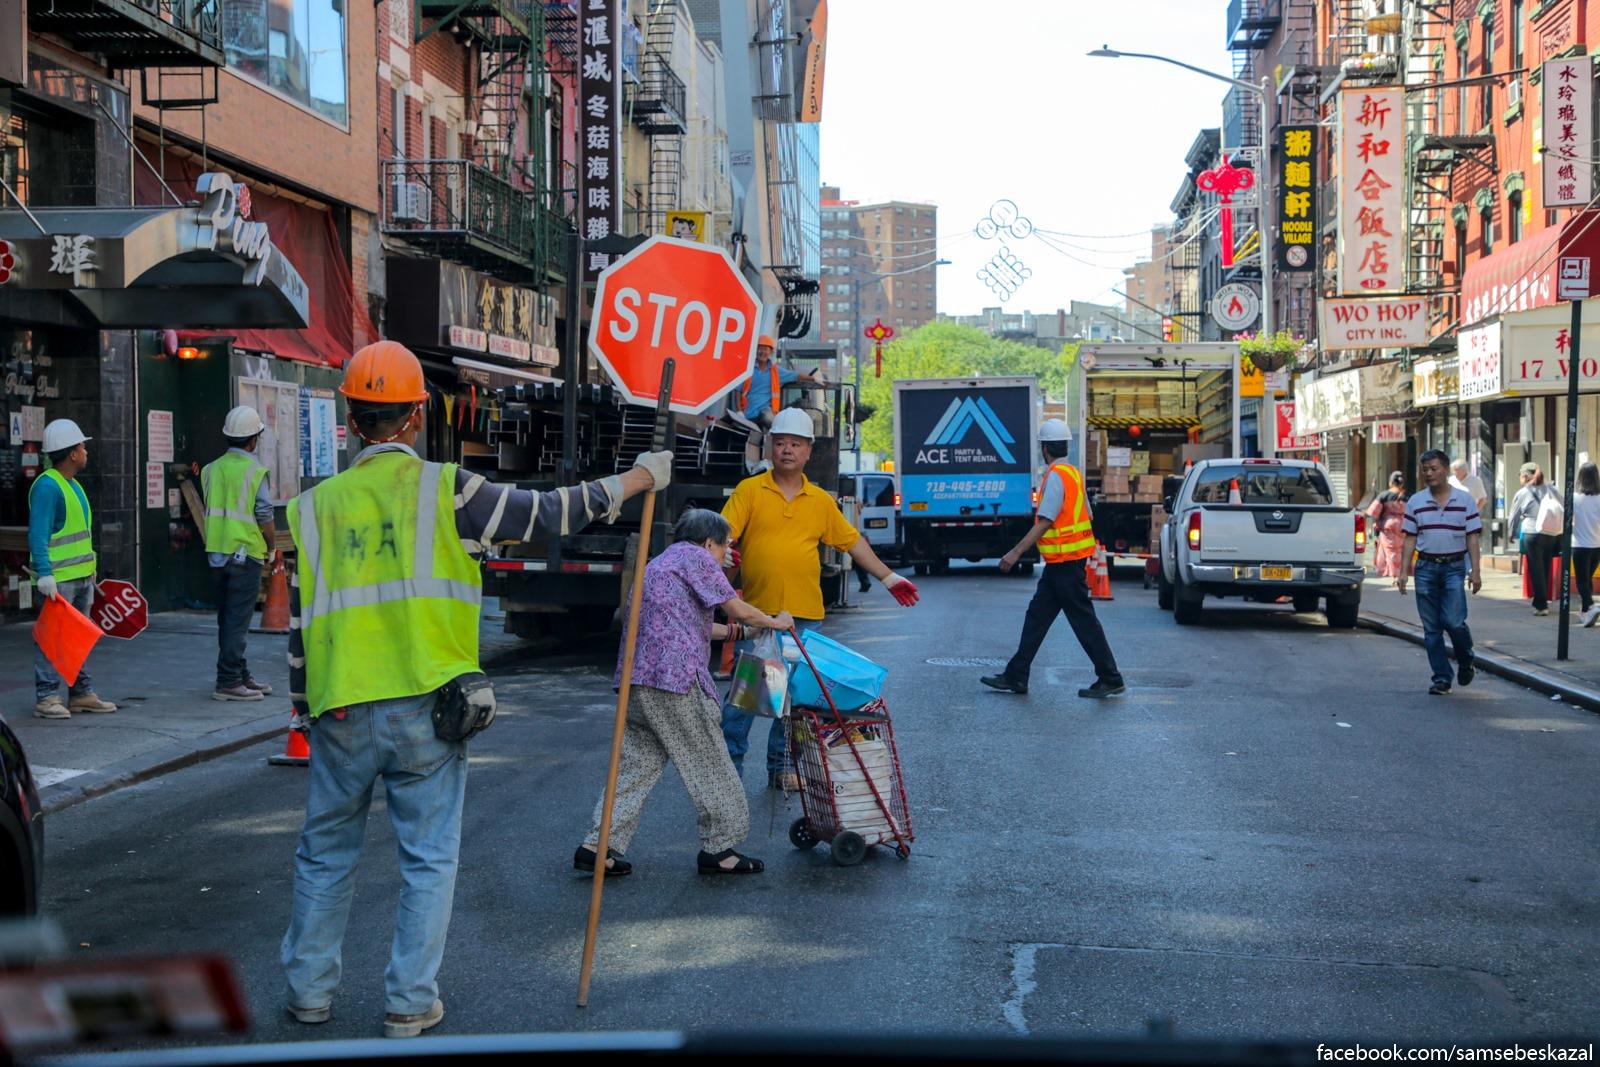 Perevedi babusku cerez ulicu. Cajnataun Manhettena.